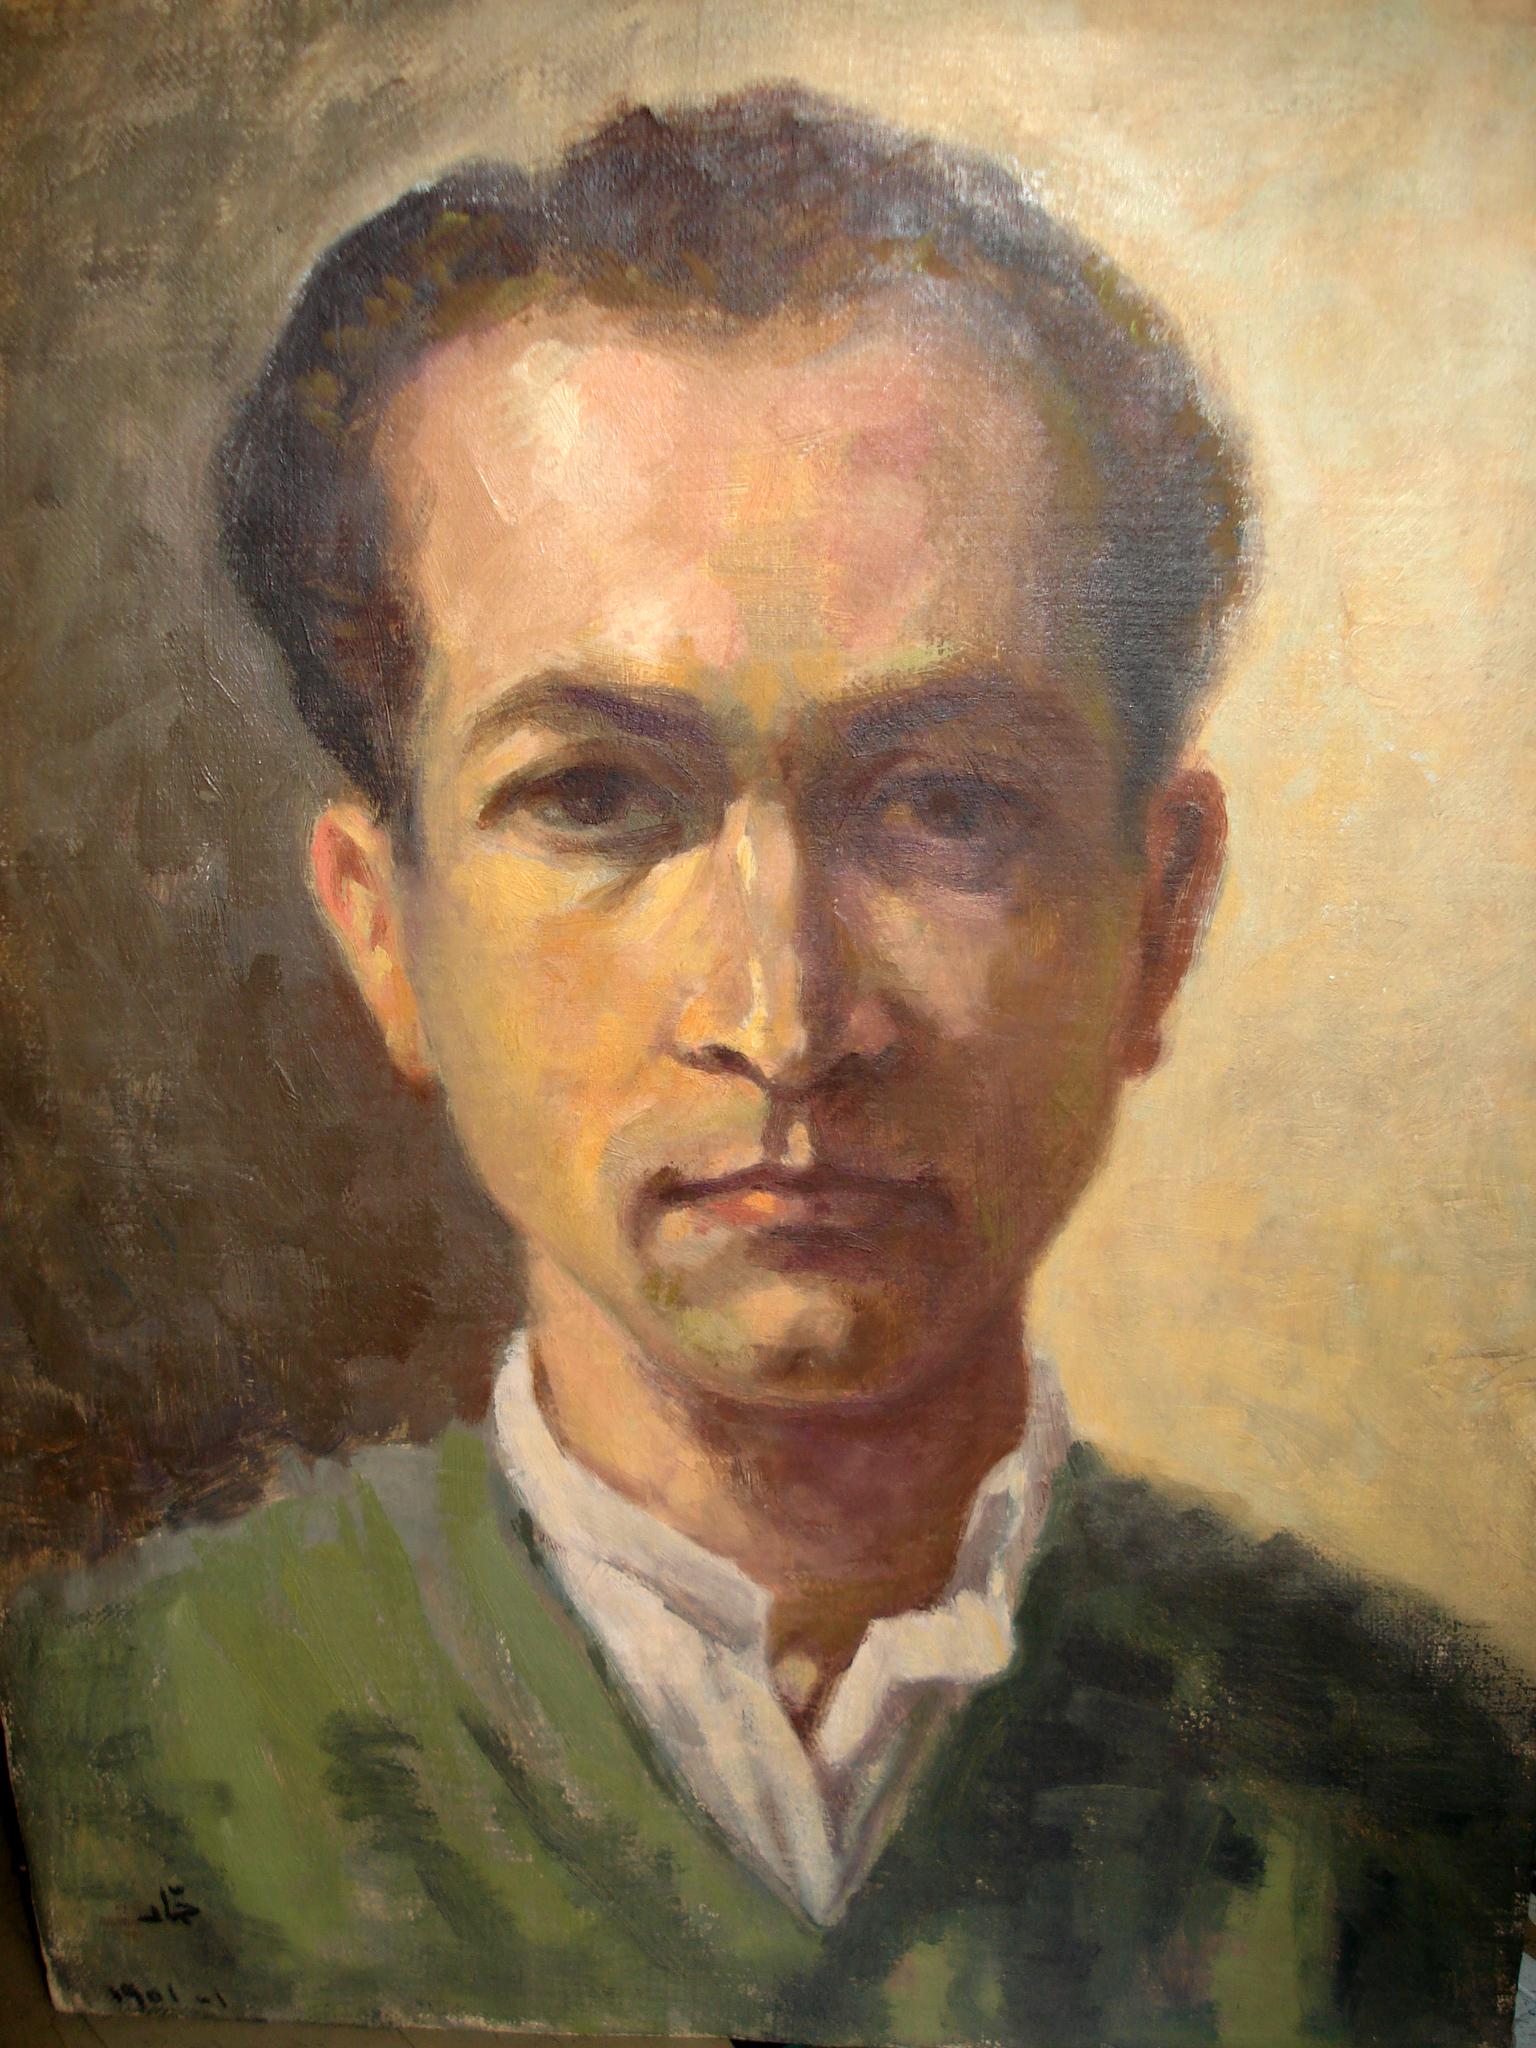 Autoportrait . 1951 . بورتريه شخصي